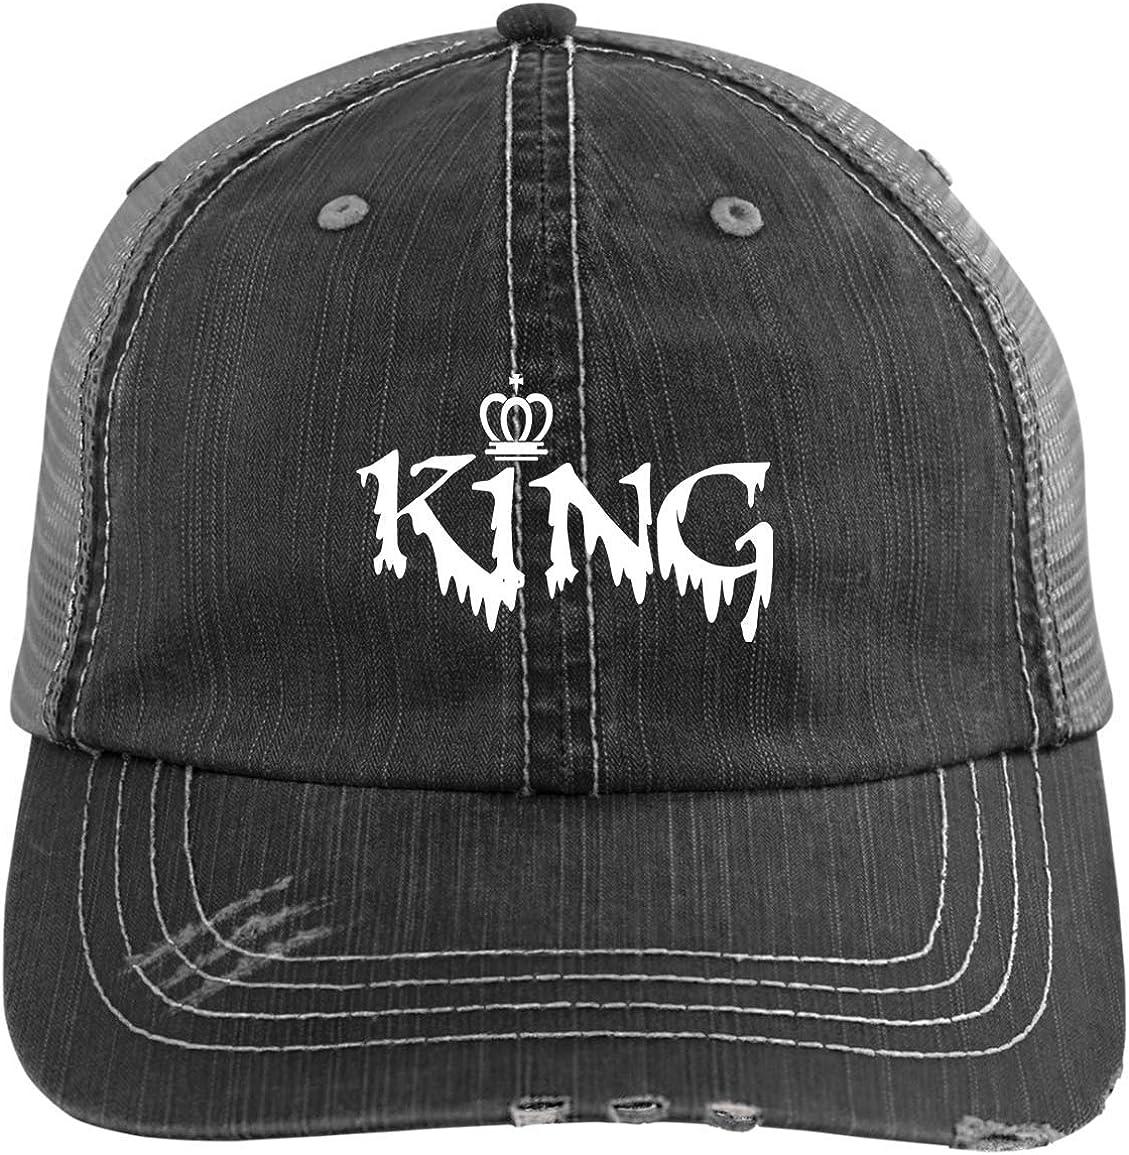 King Hats Matching Snapbacks Hip Hop